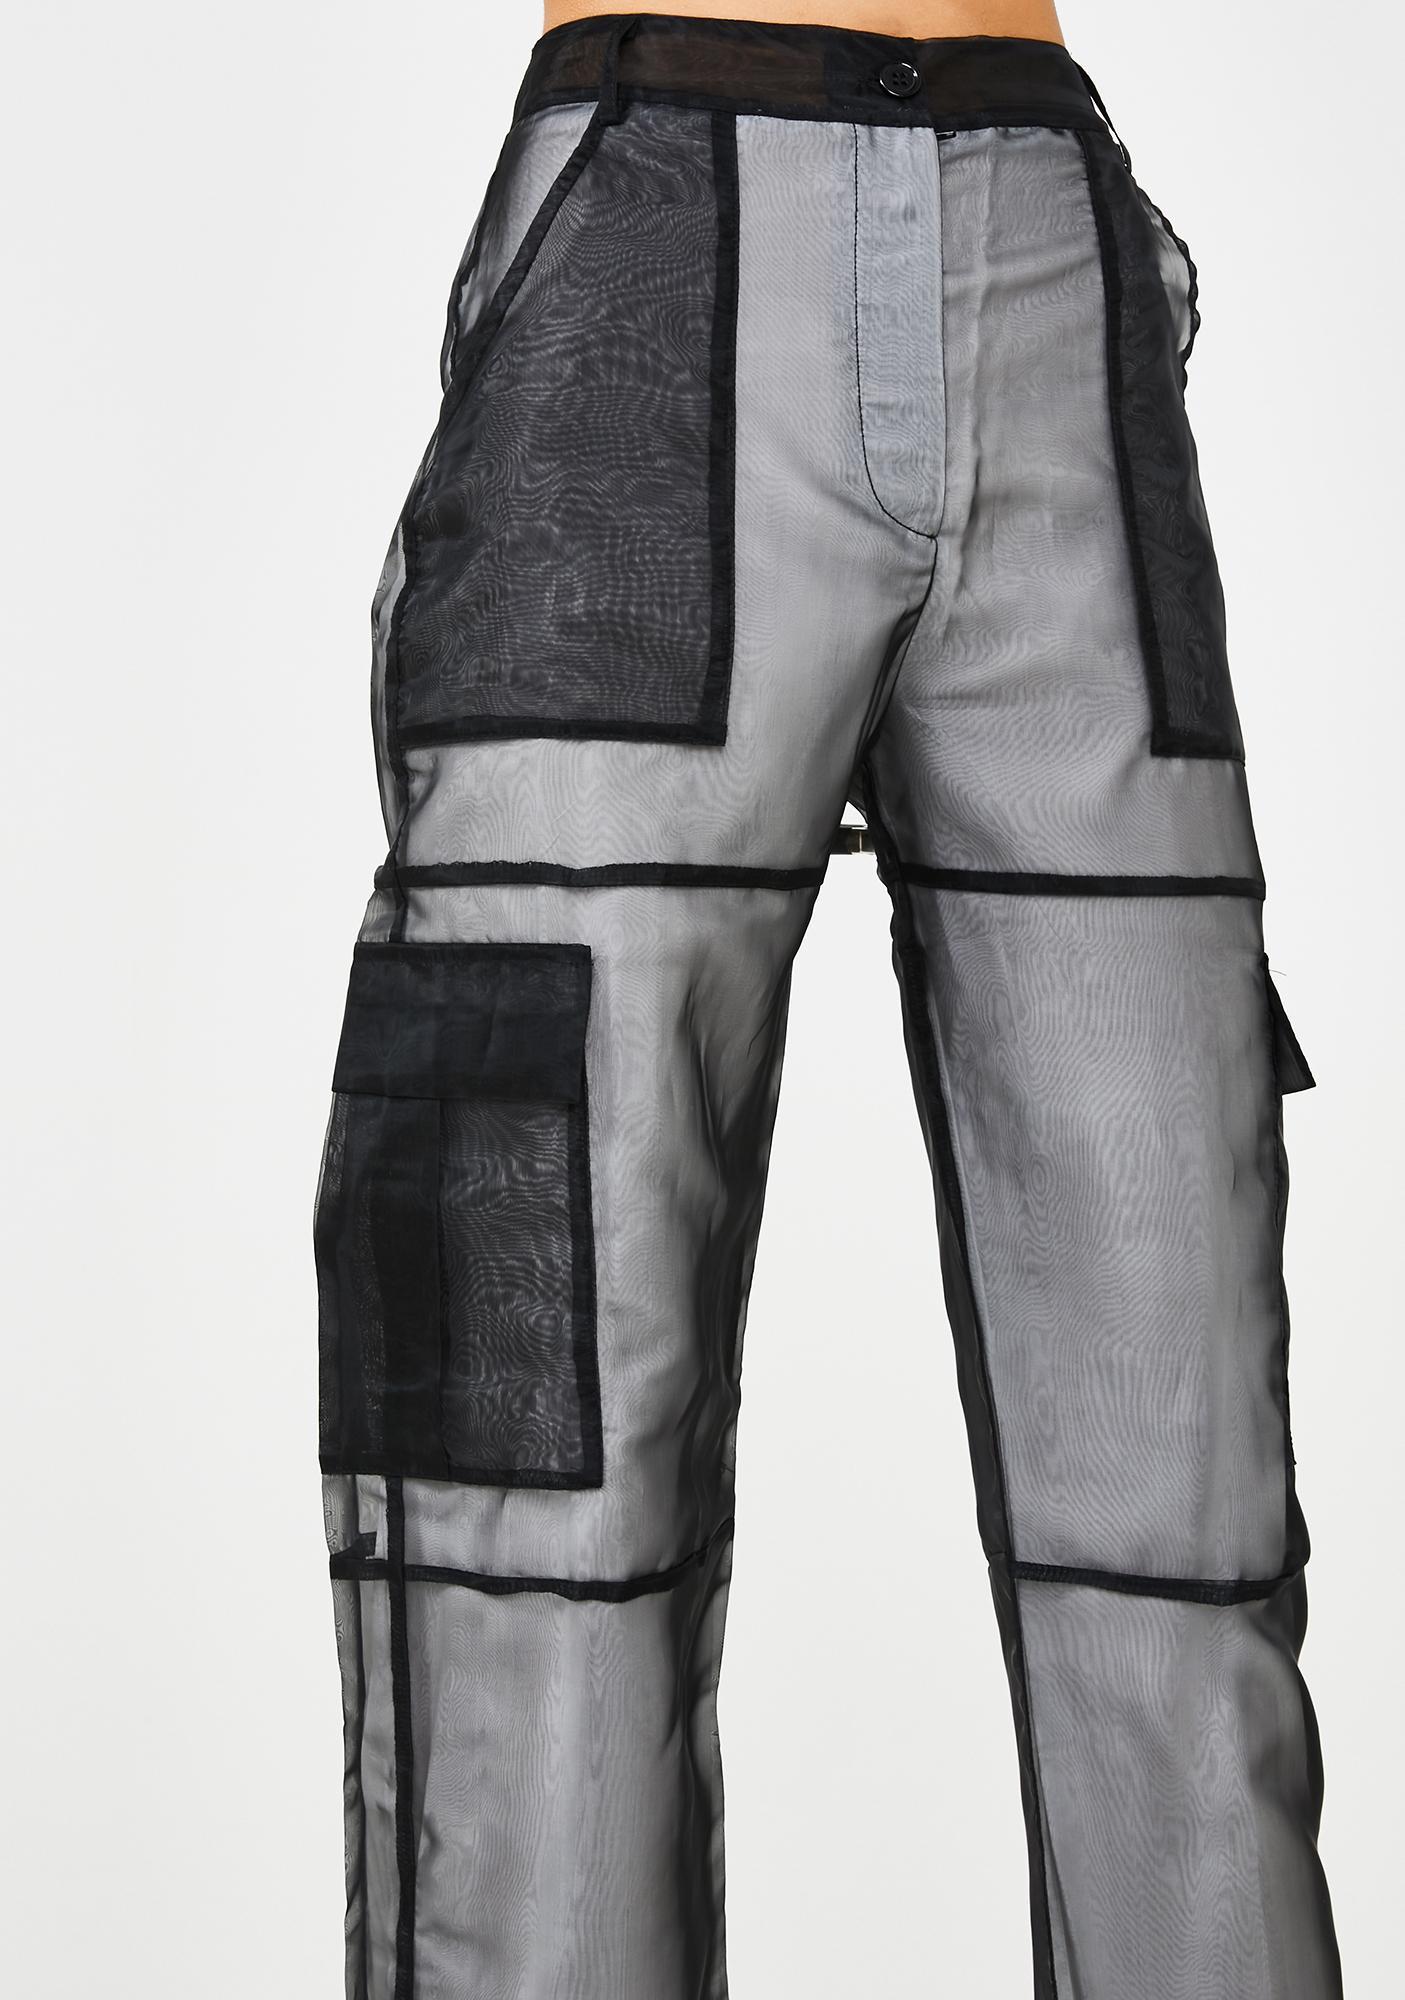 The Ragged Priest Fury Combat Pants